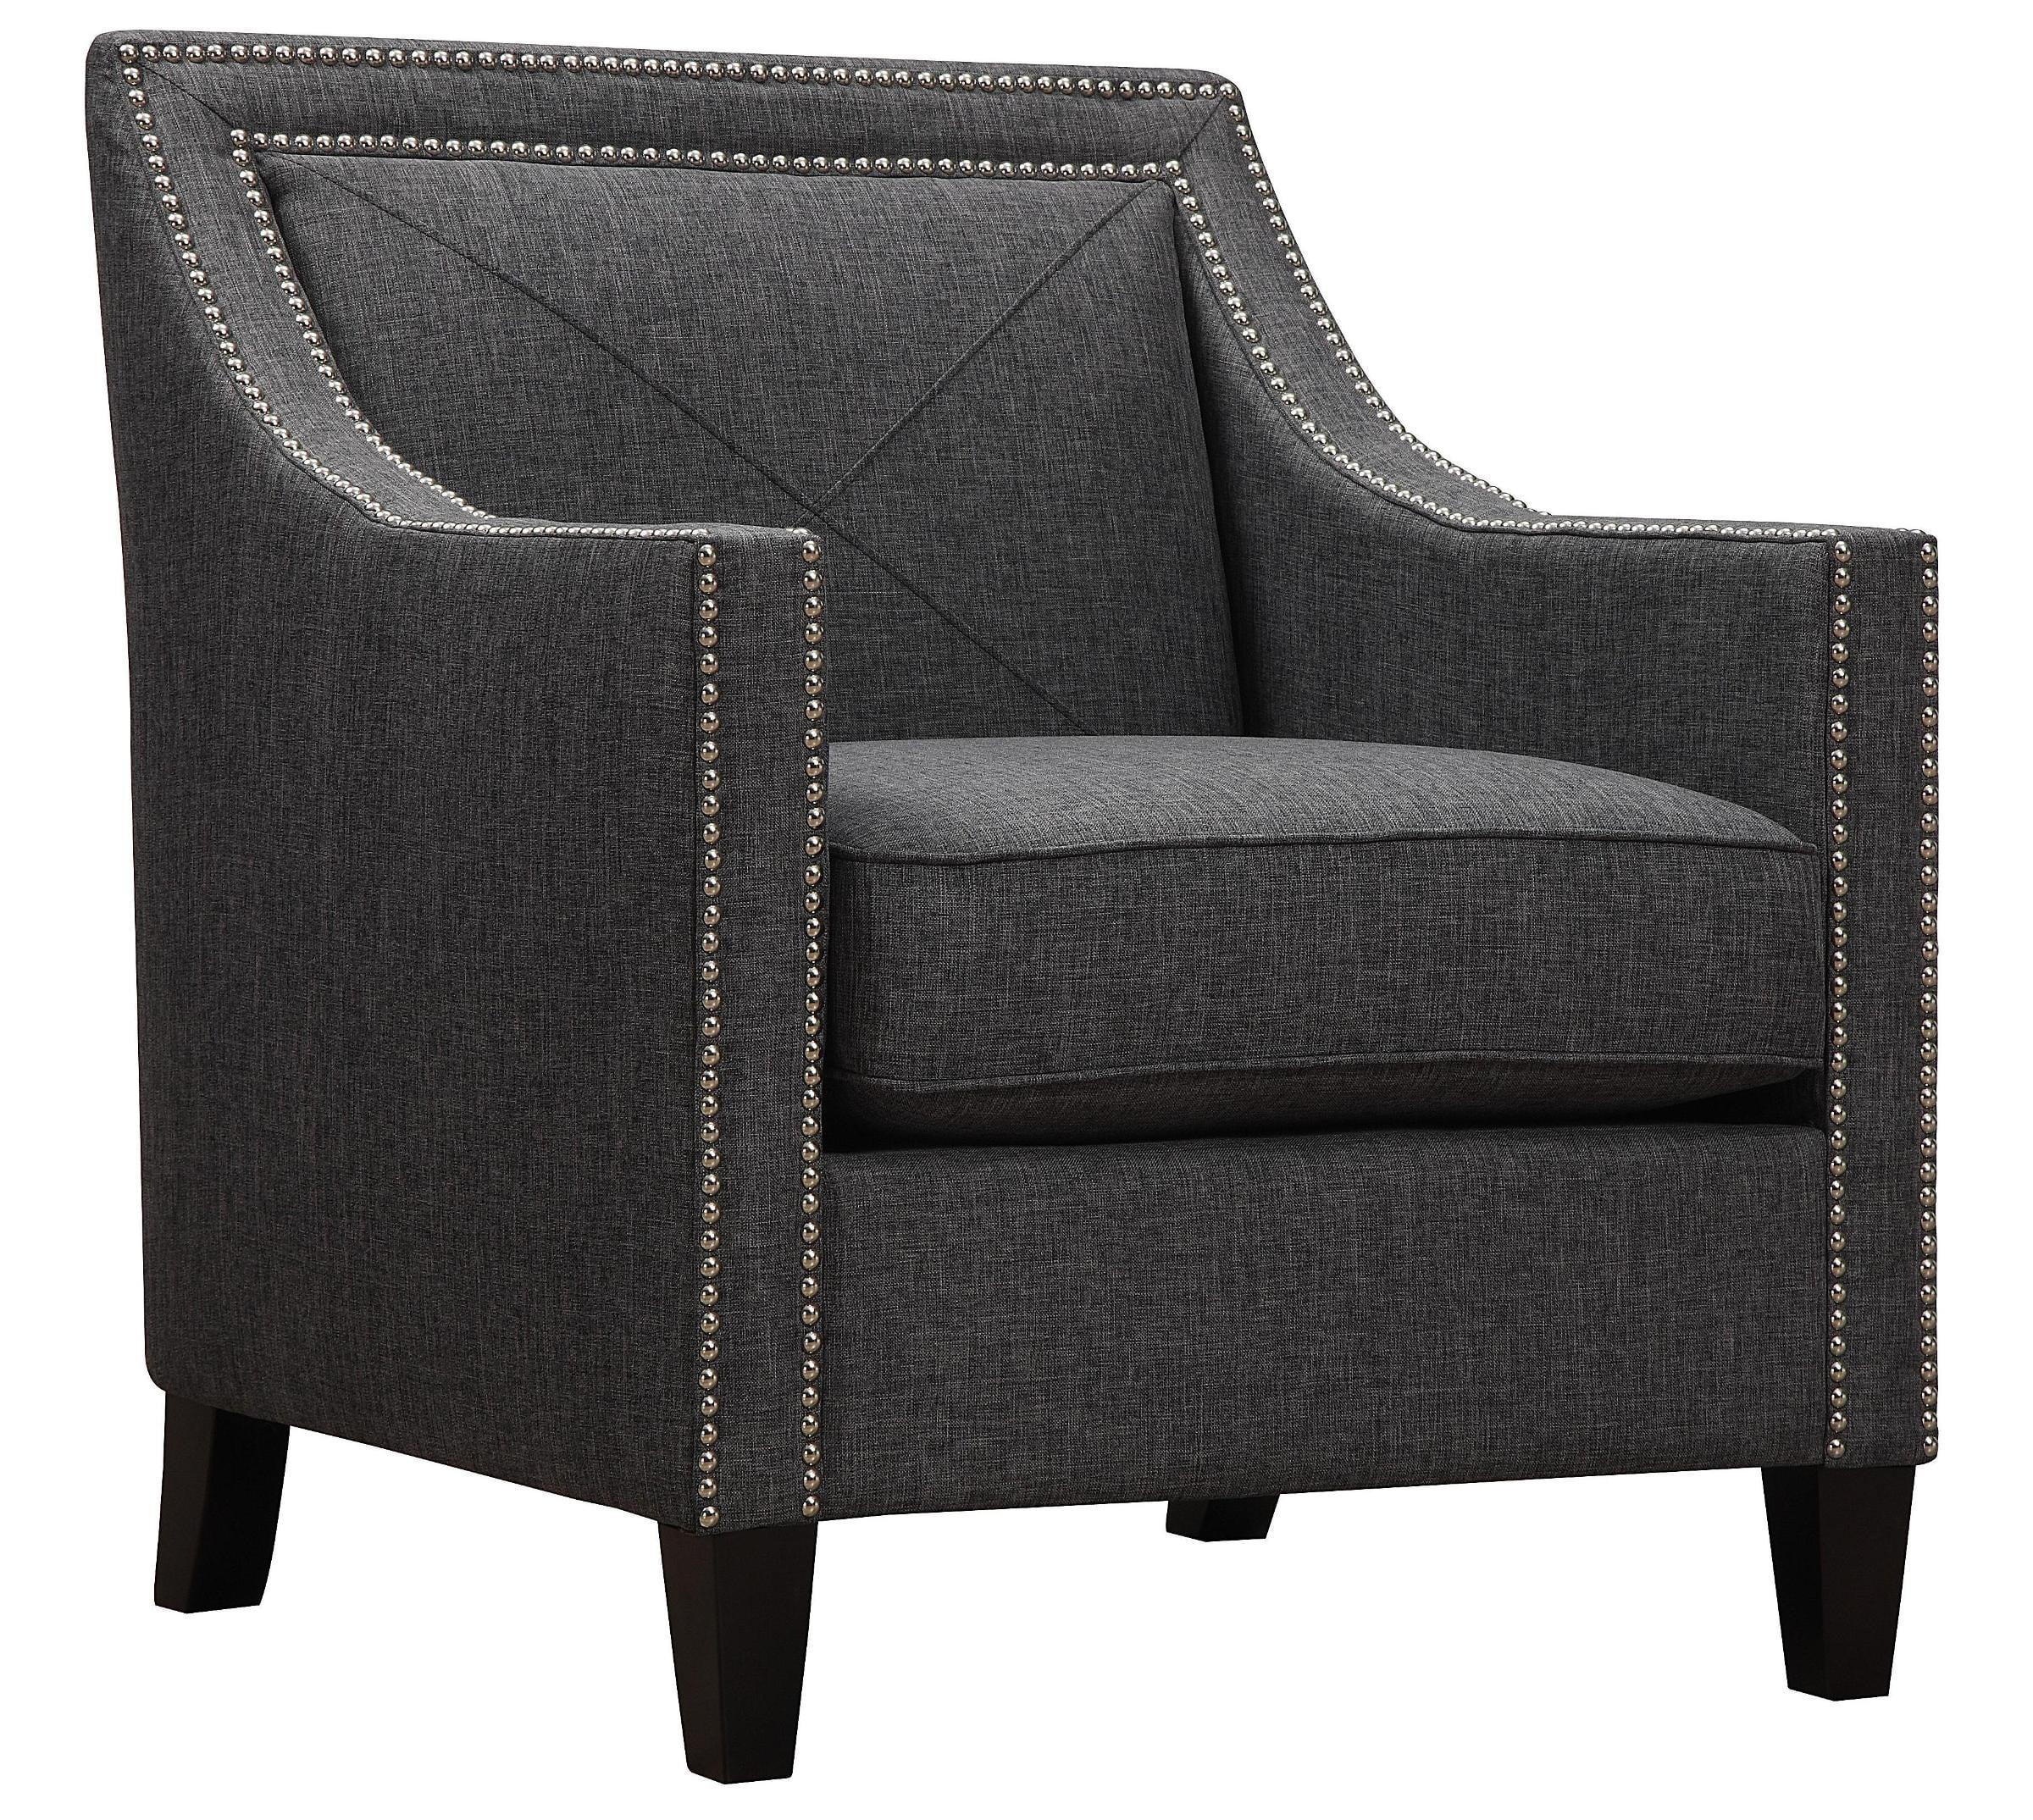 Asheville Dark Grey Linen Chair From TOV (A51)